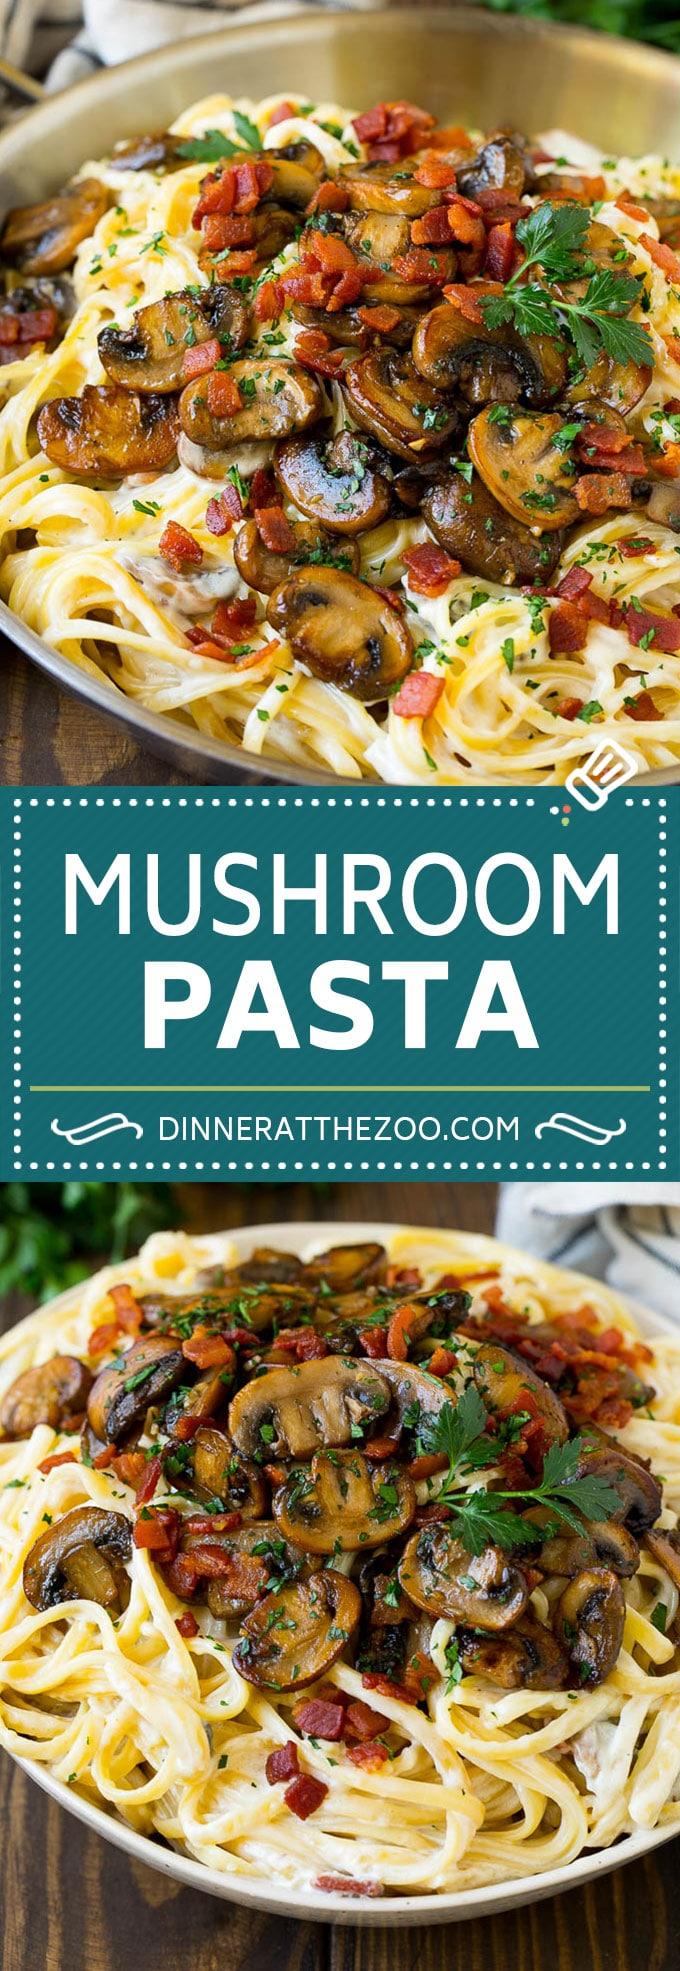 Mushroom Pasta Recipe   Creamy Pasta #pasta #mushrooms #bacon #dinner #dinneratthezoo